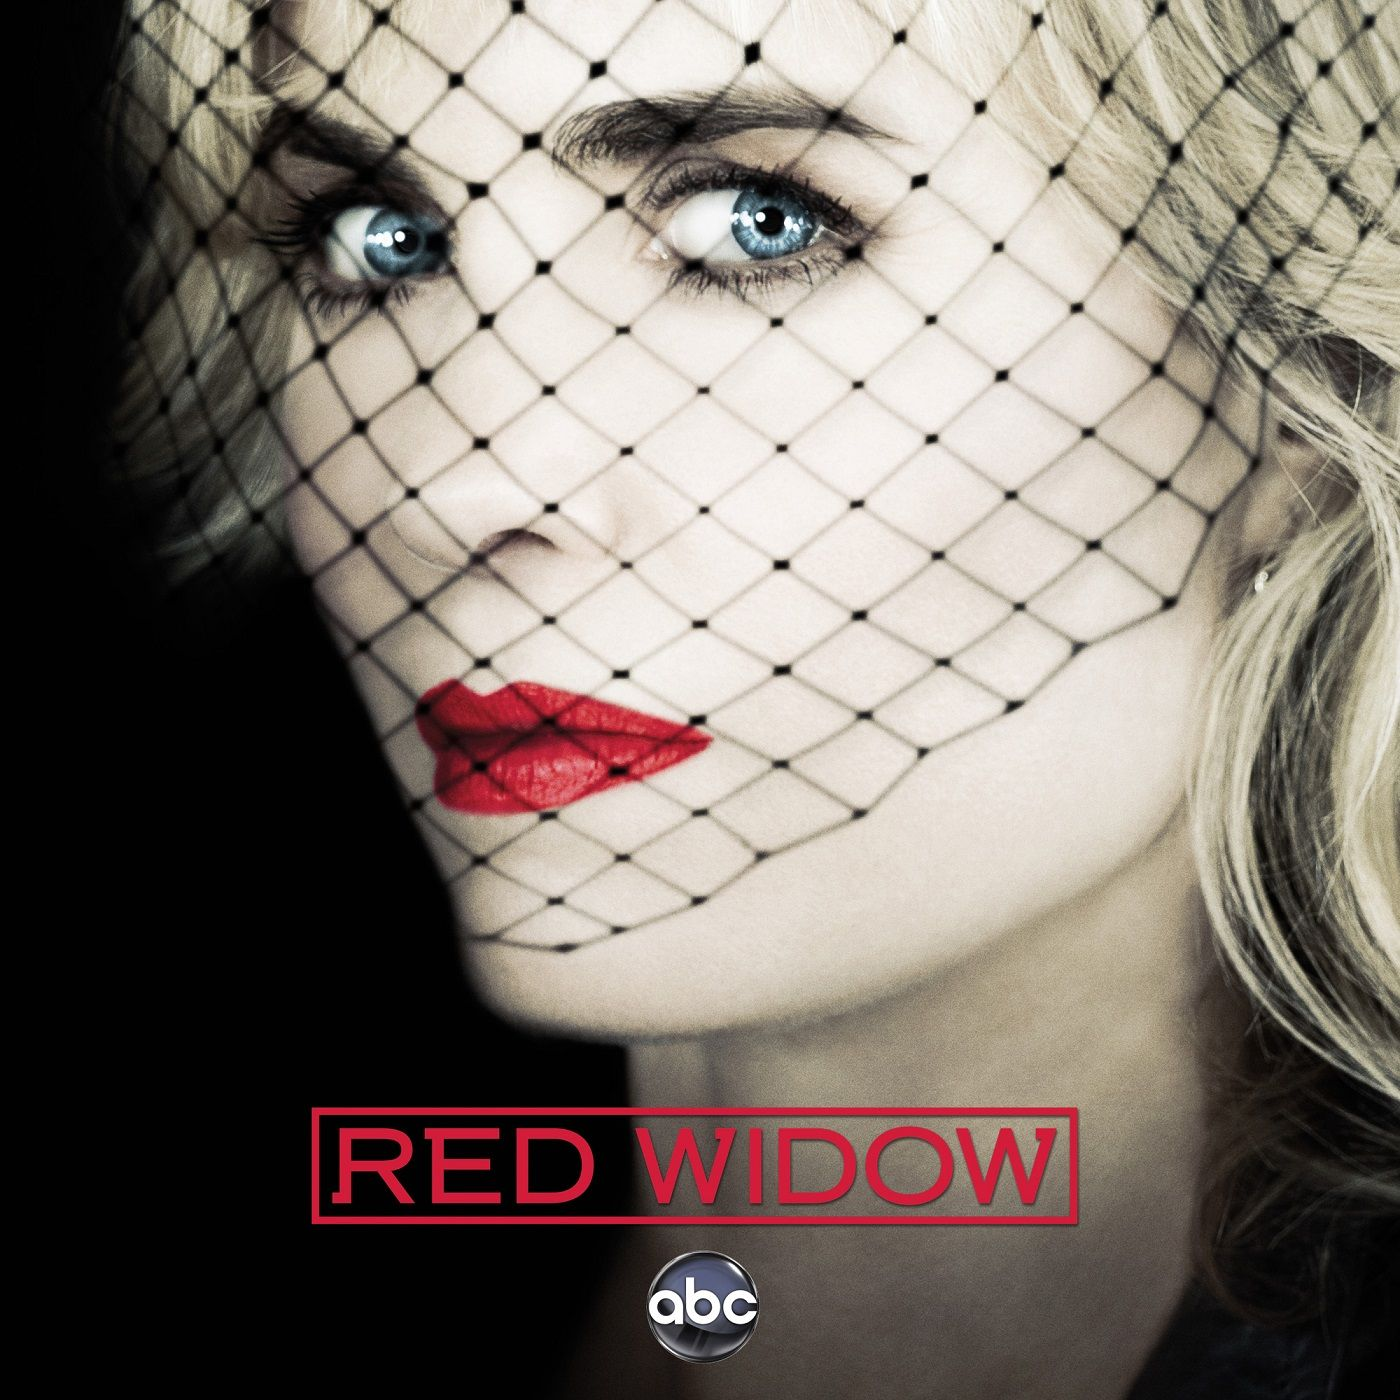 Red Widow S01 Season 1 720p WEB-DL H264-KiNGS